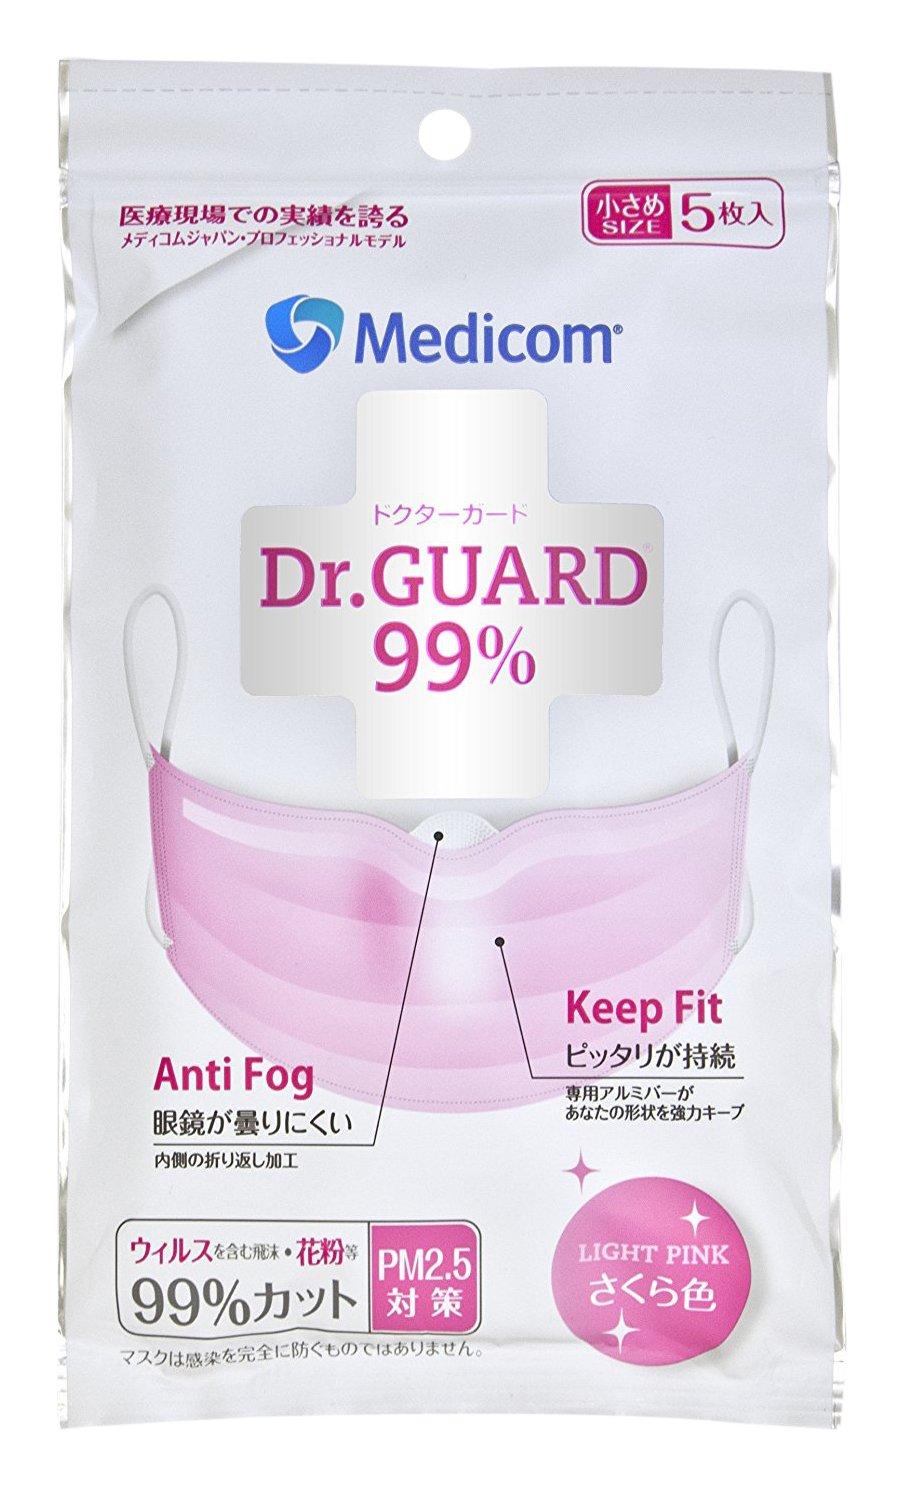 Medicom JMK2384 Doctor Guard Mask S Size Sakura 5 Count